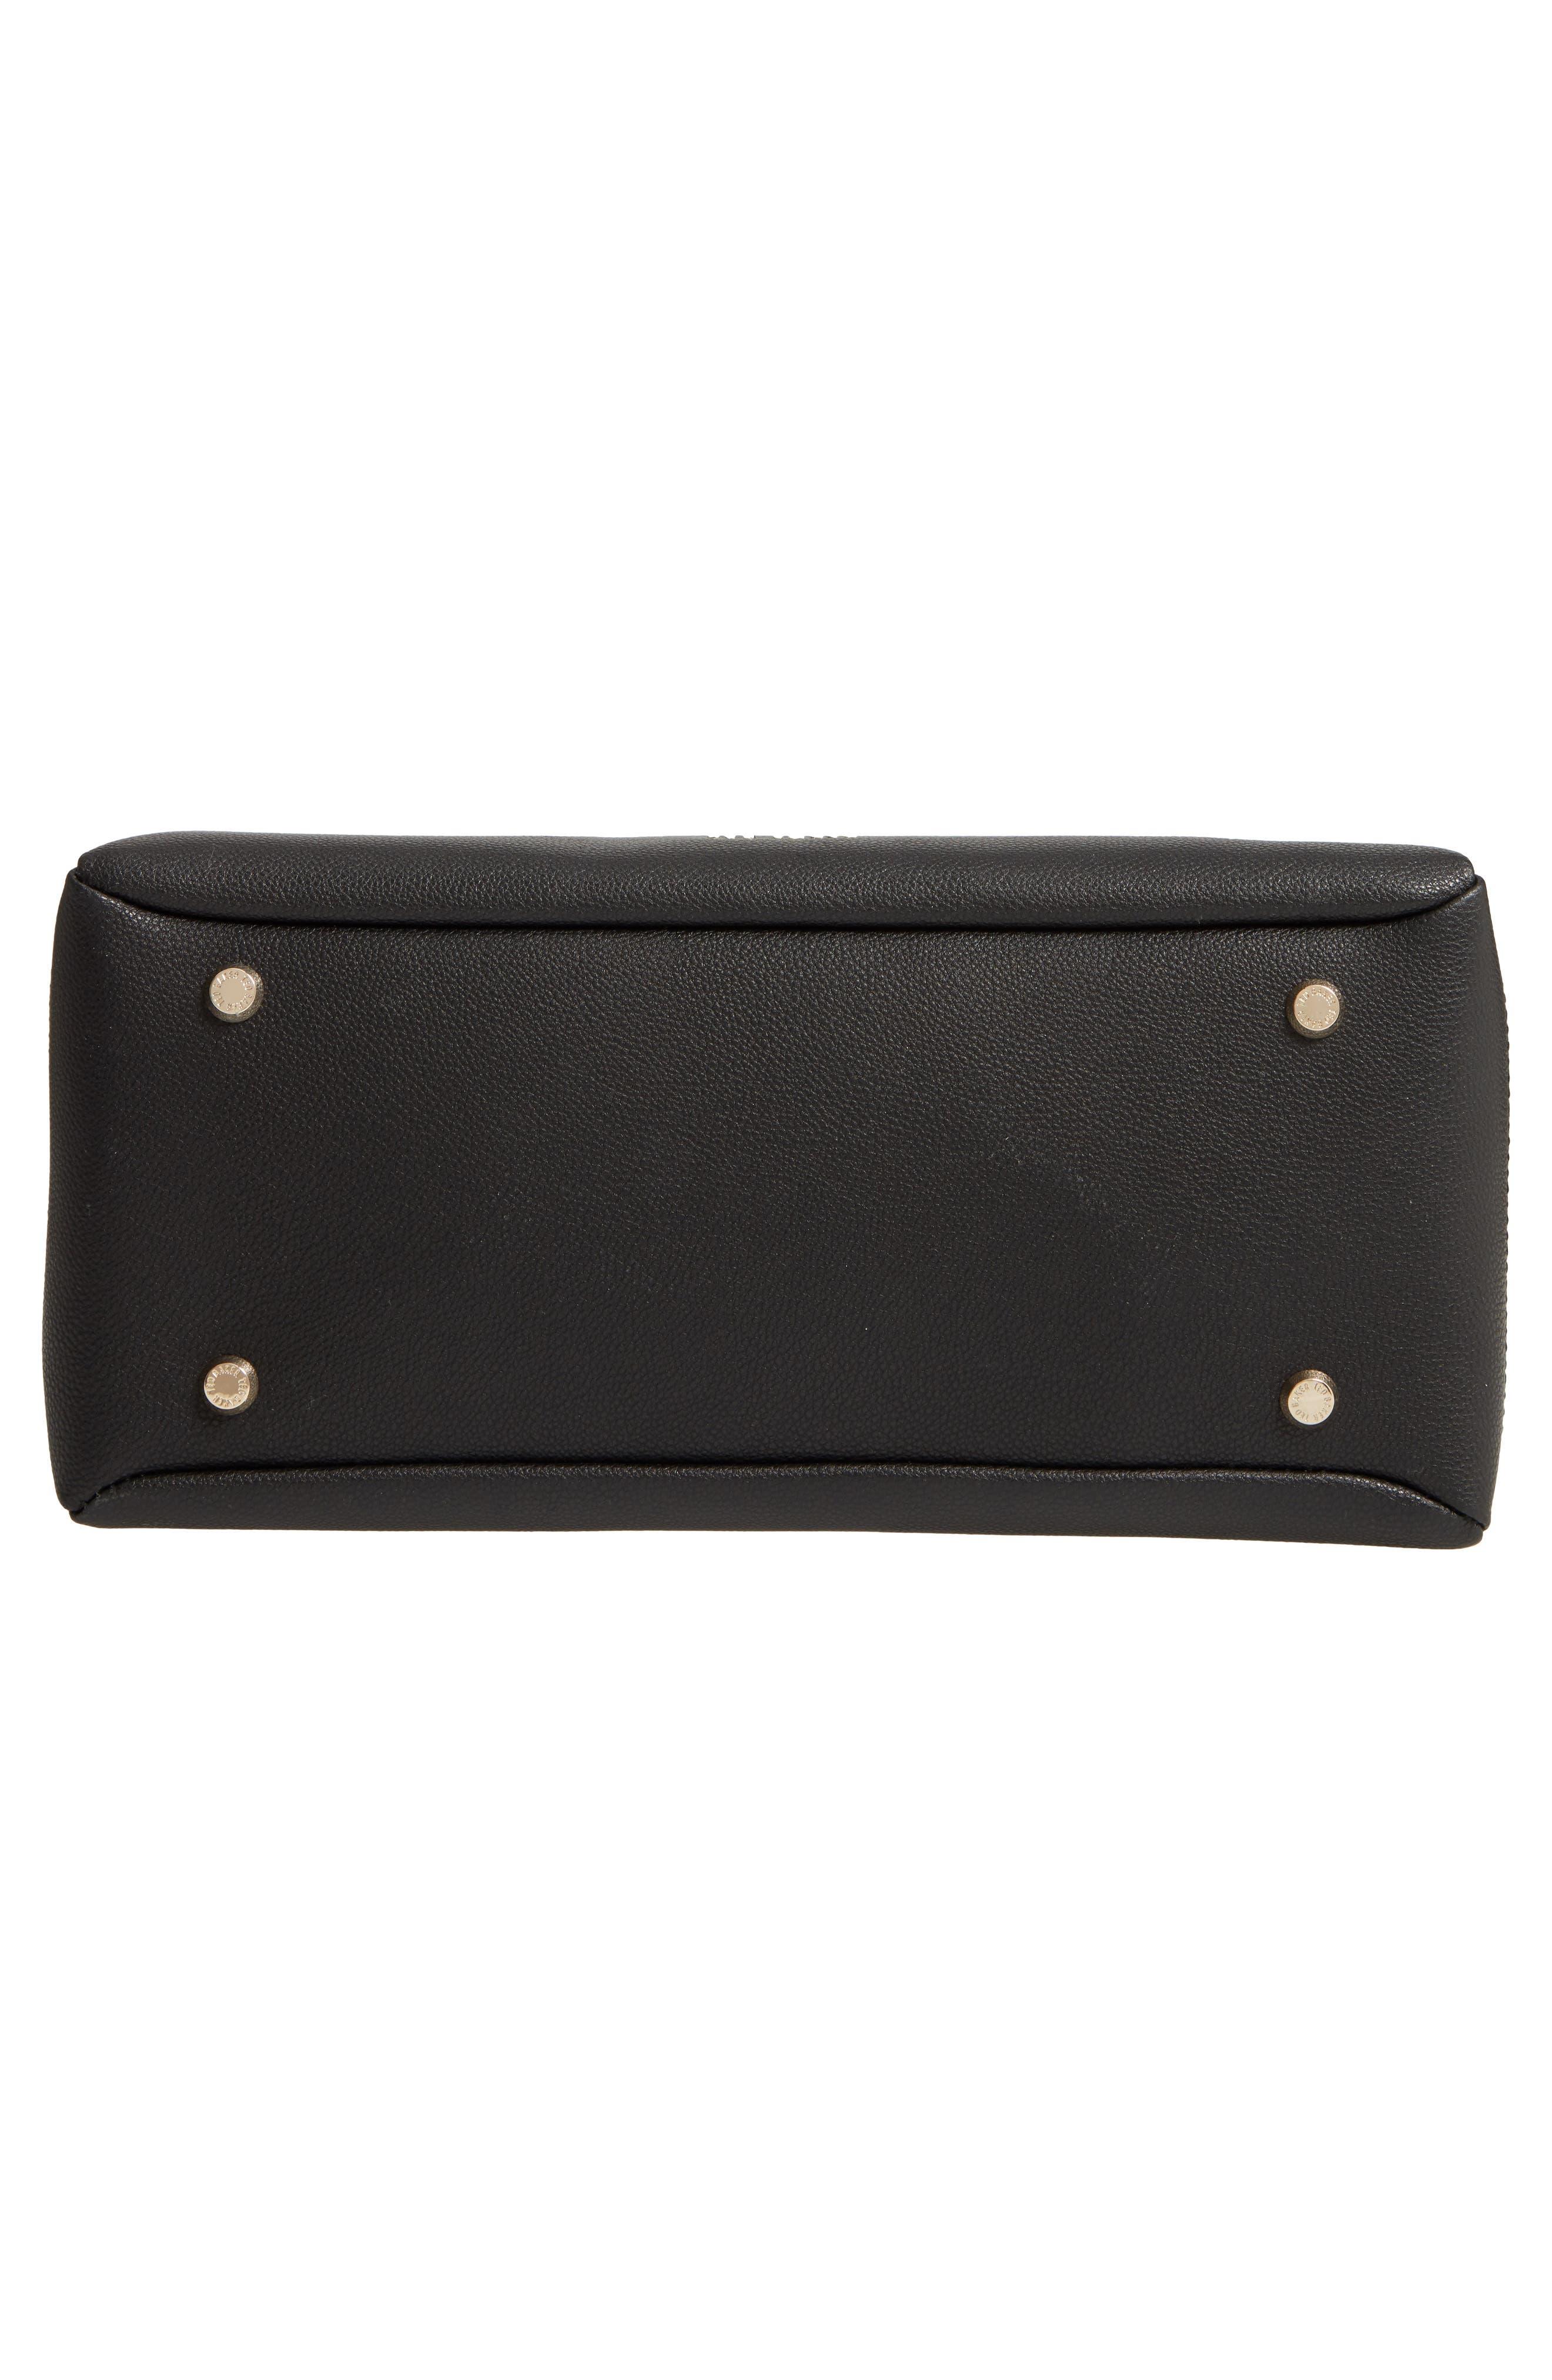 Julieet Large Adjustable Handle Leather Satchel,                             Alternate thumbnail 6, color,                             BLACK